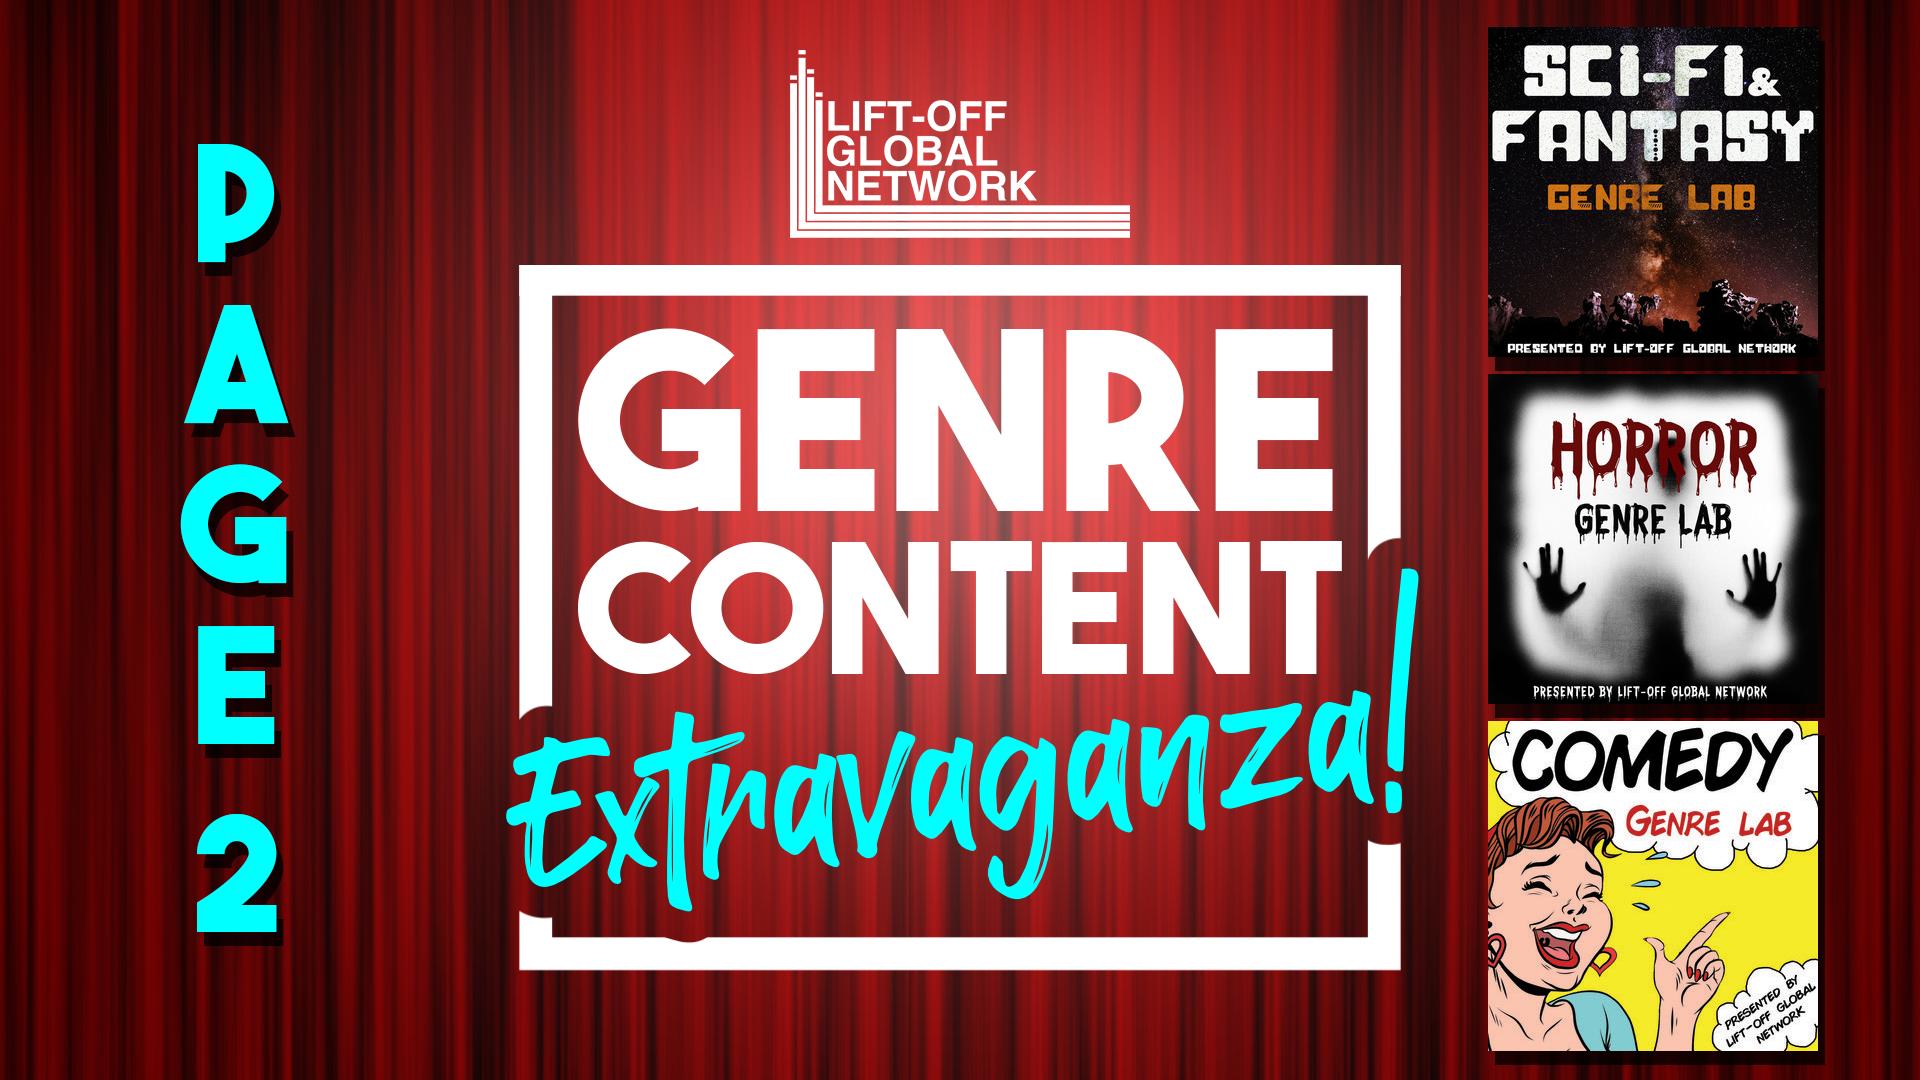 GL Extravaganza p2 - poster - landscape